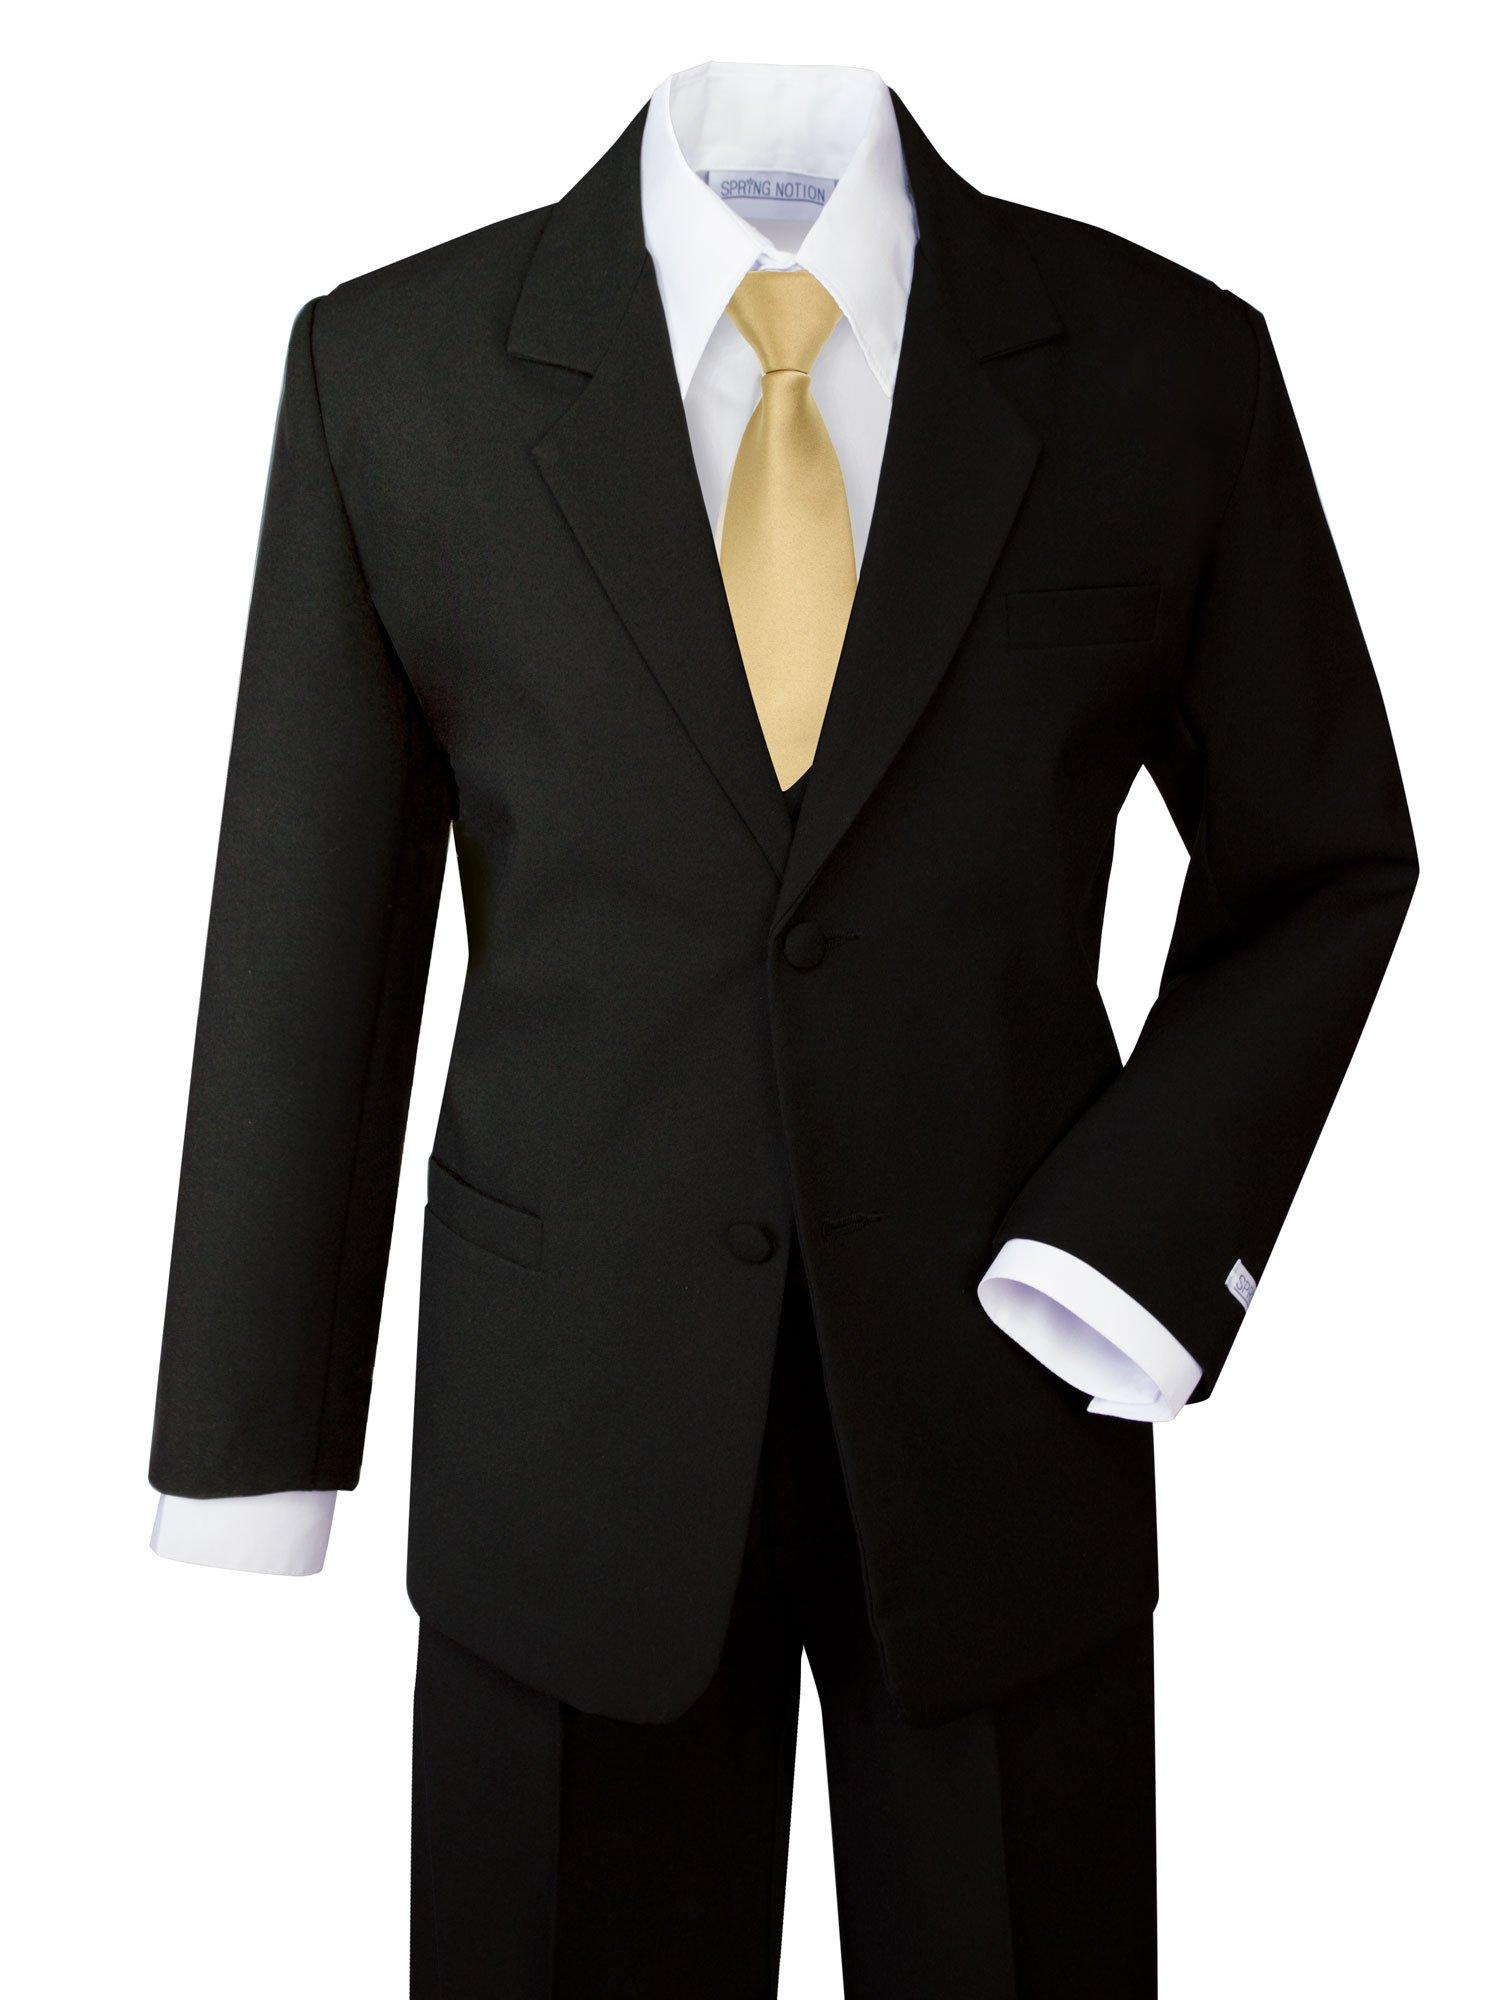 Spring Notion Boys' Formal Dress Suit Set 12 Black Suit Antique Gold Tie by Spring Notion